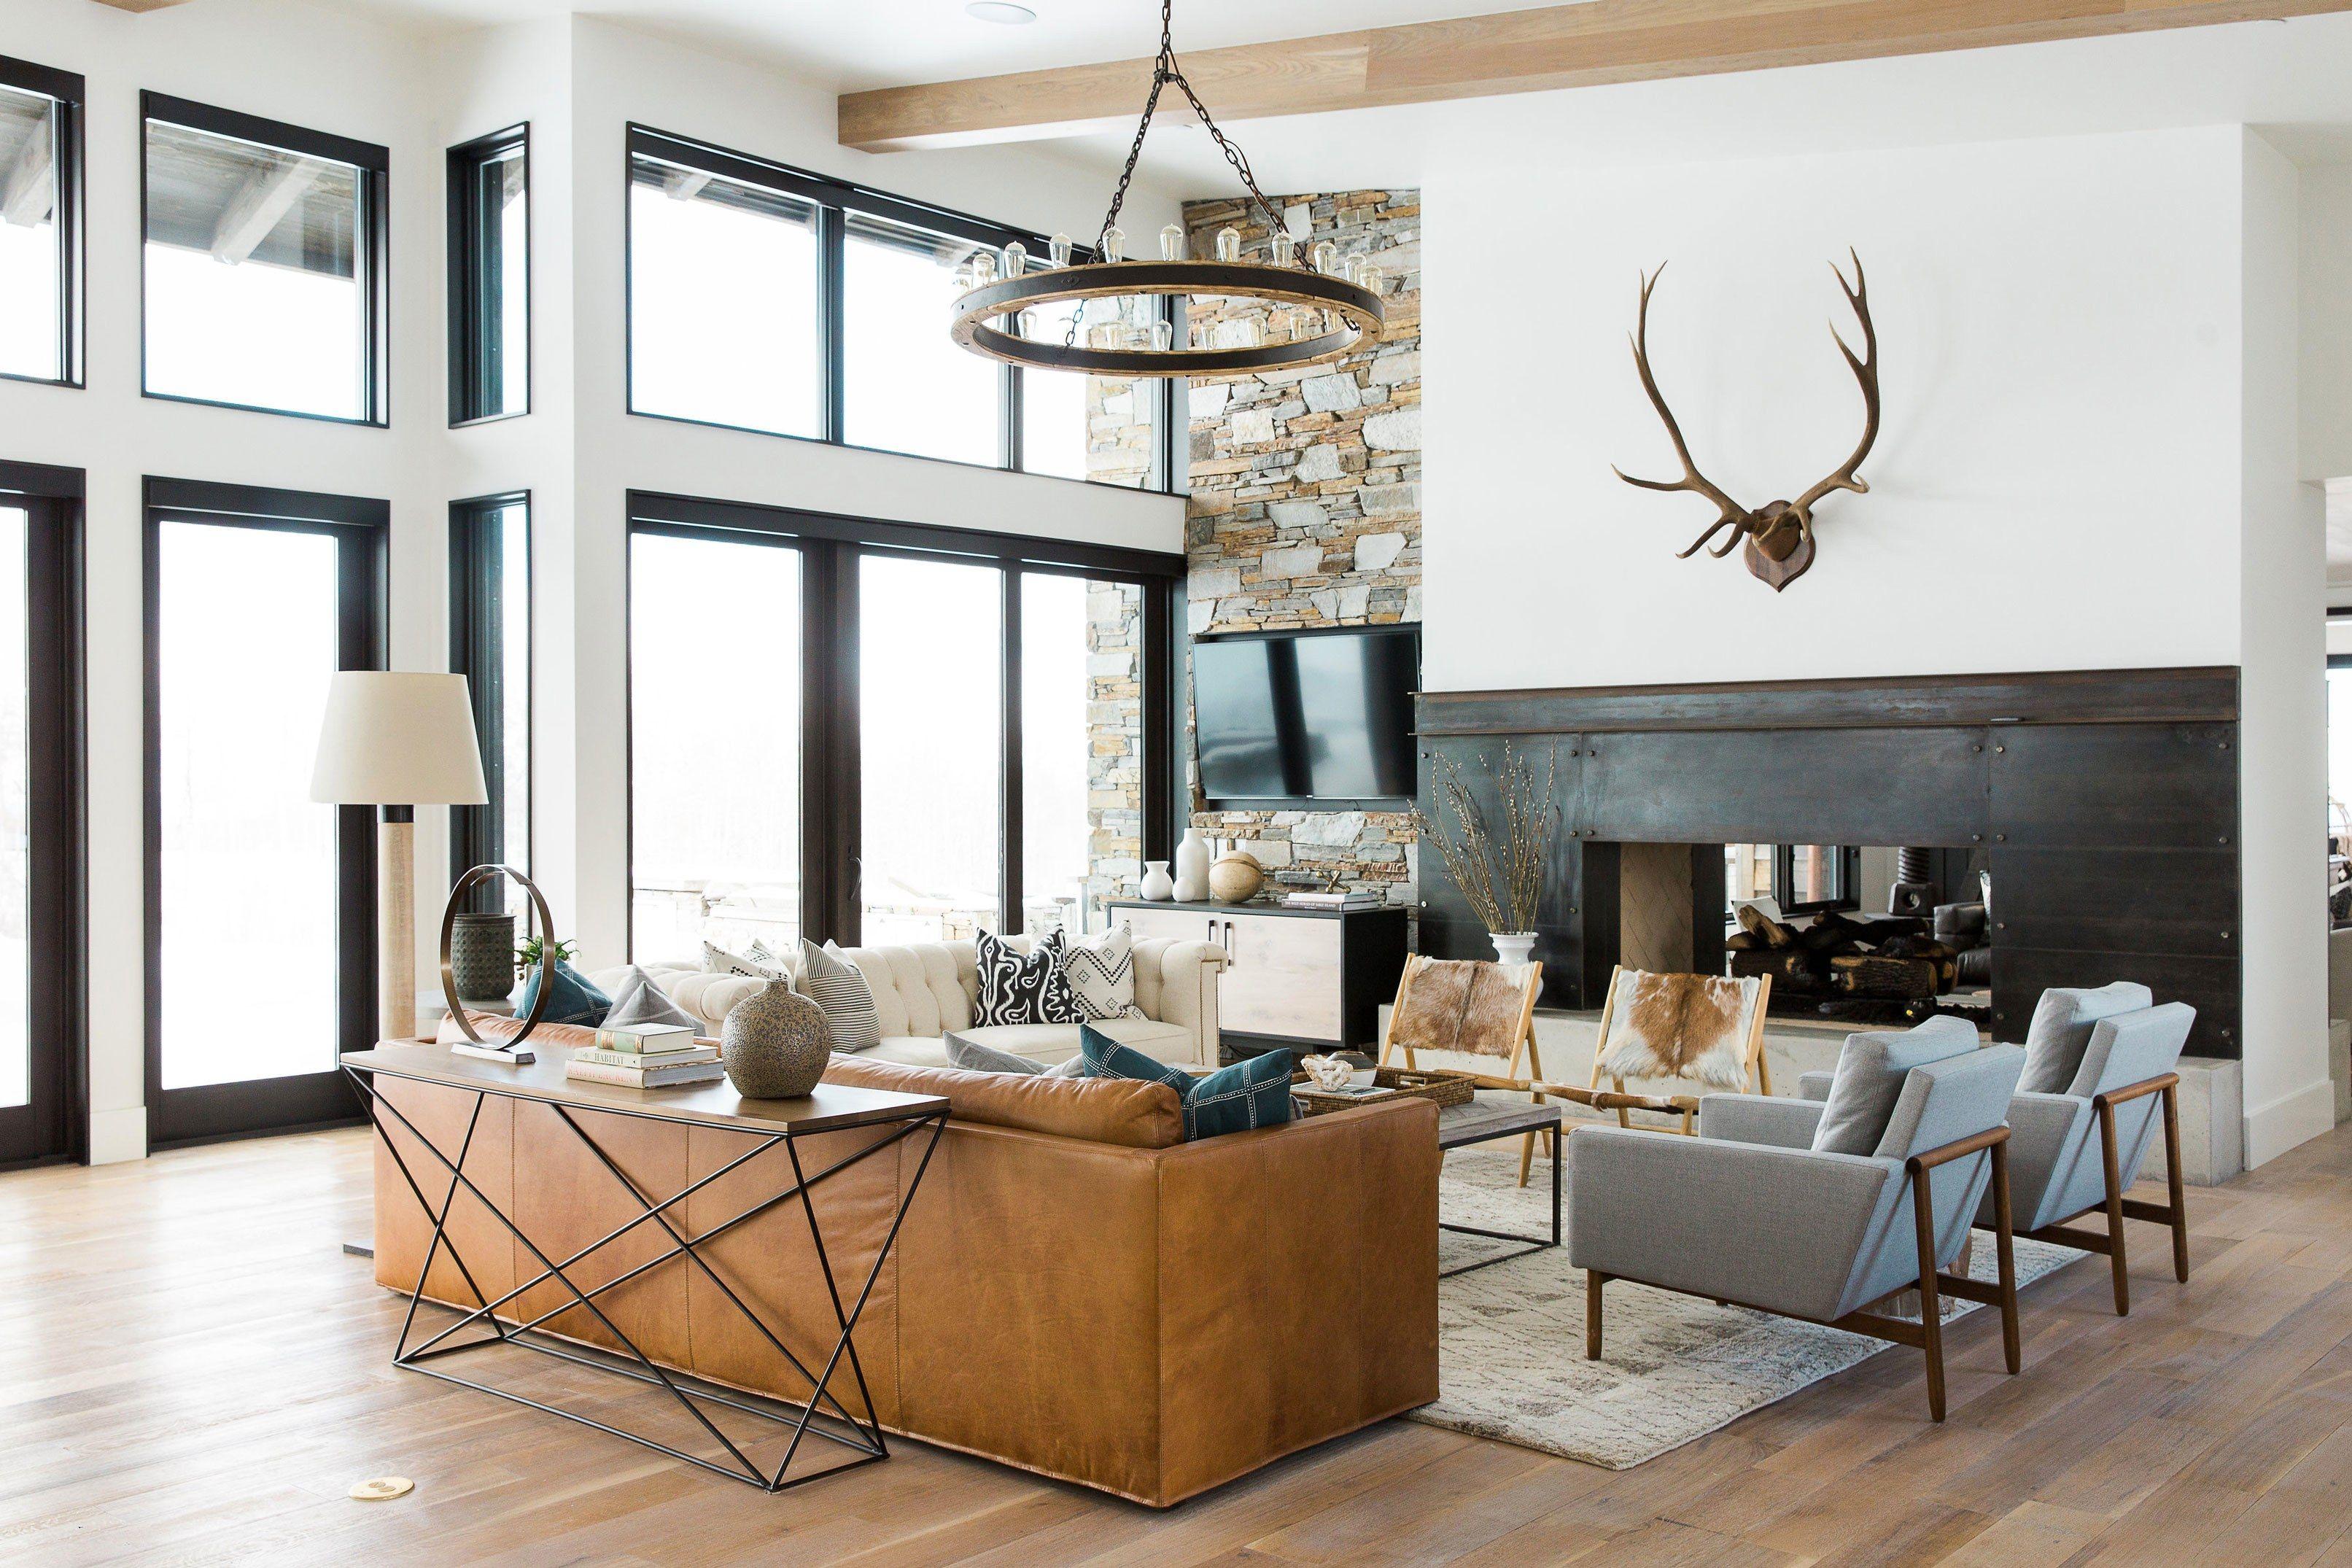 Studio mcgee gives a utah mountain home a modern edge - Modern mountain home interior design ...